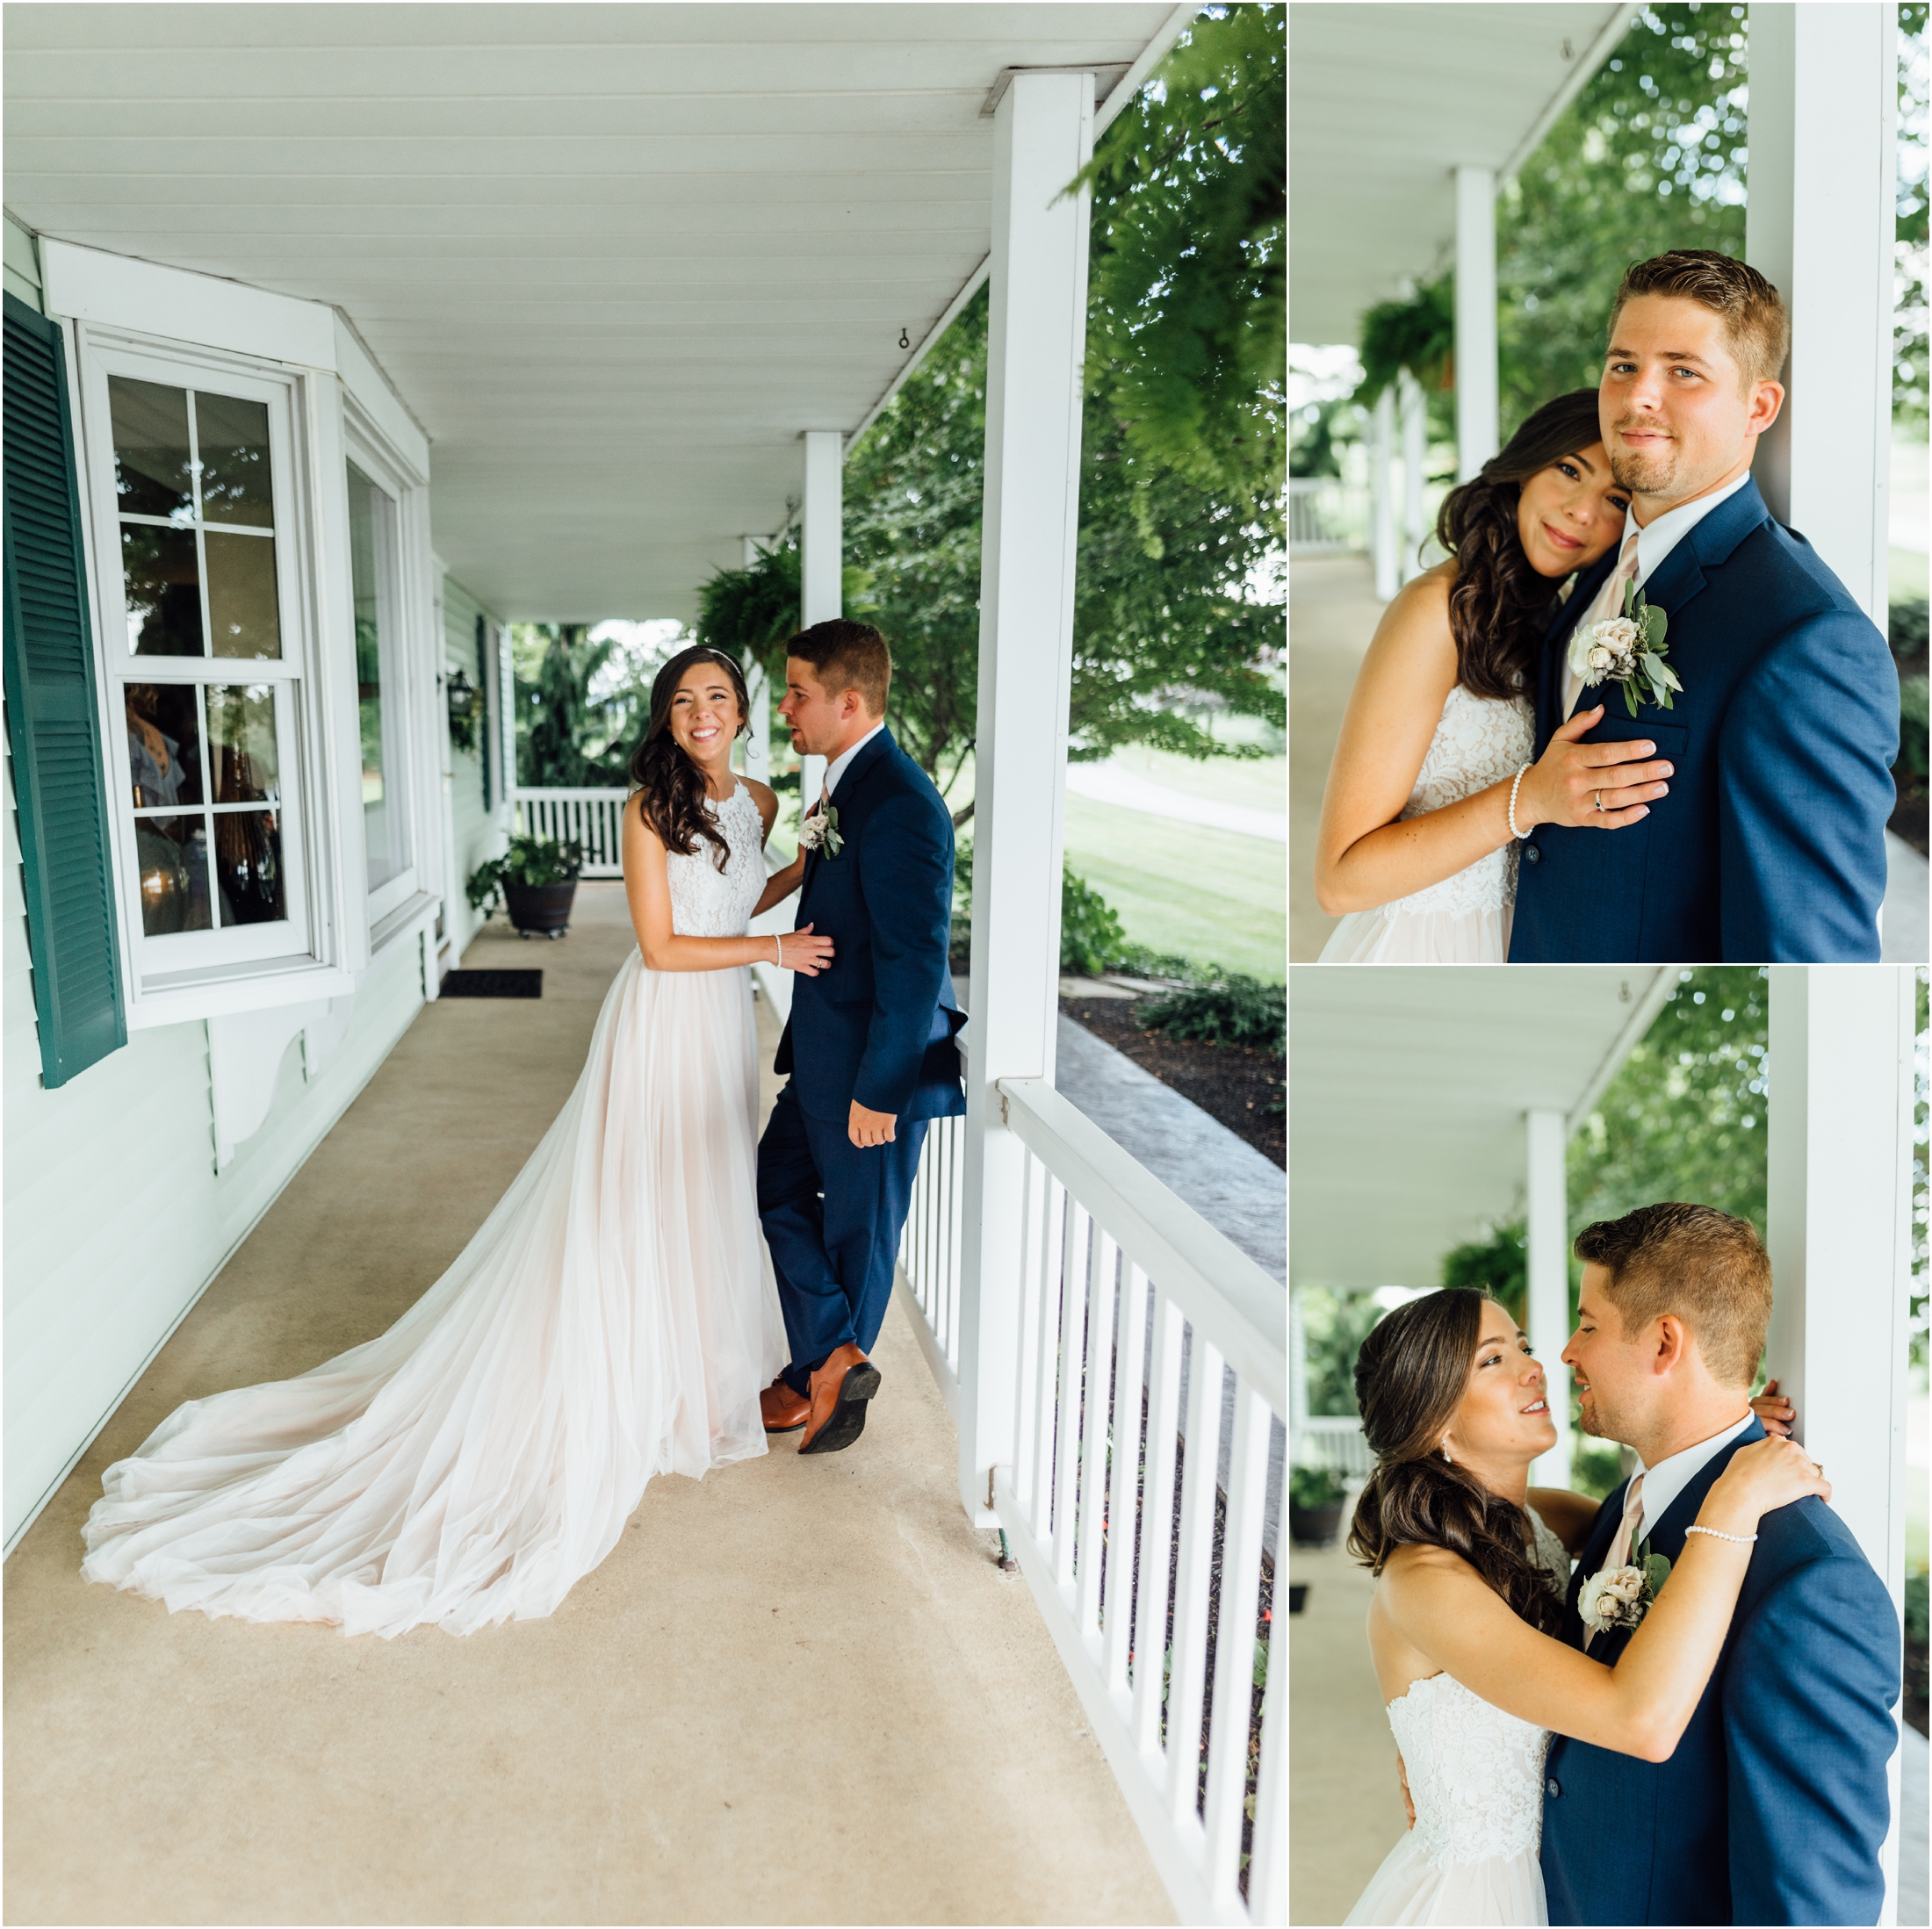 Steph&Bryan_Lancaster_wedding_farm_0530.jpg